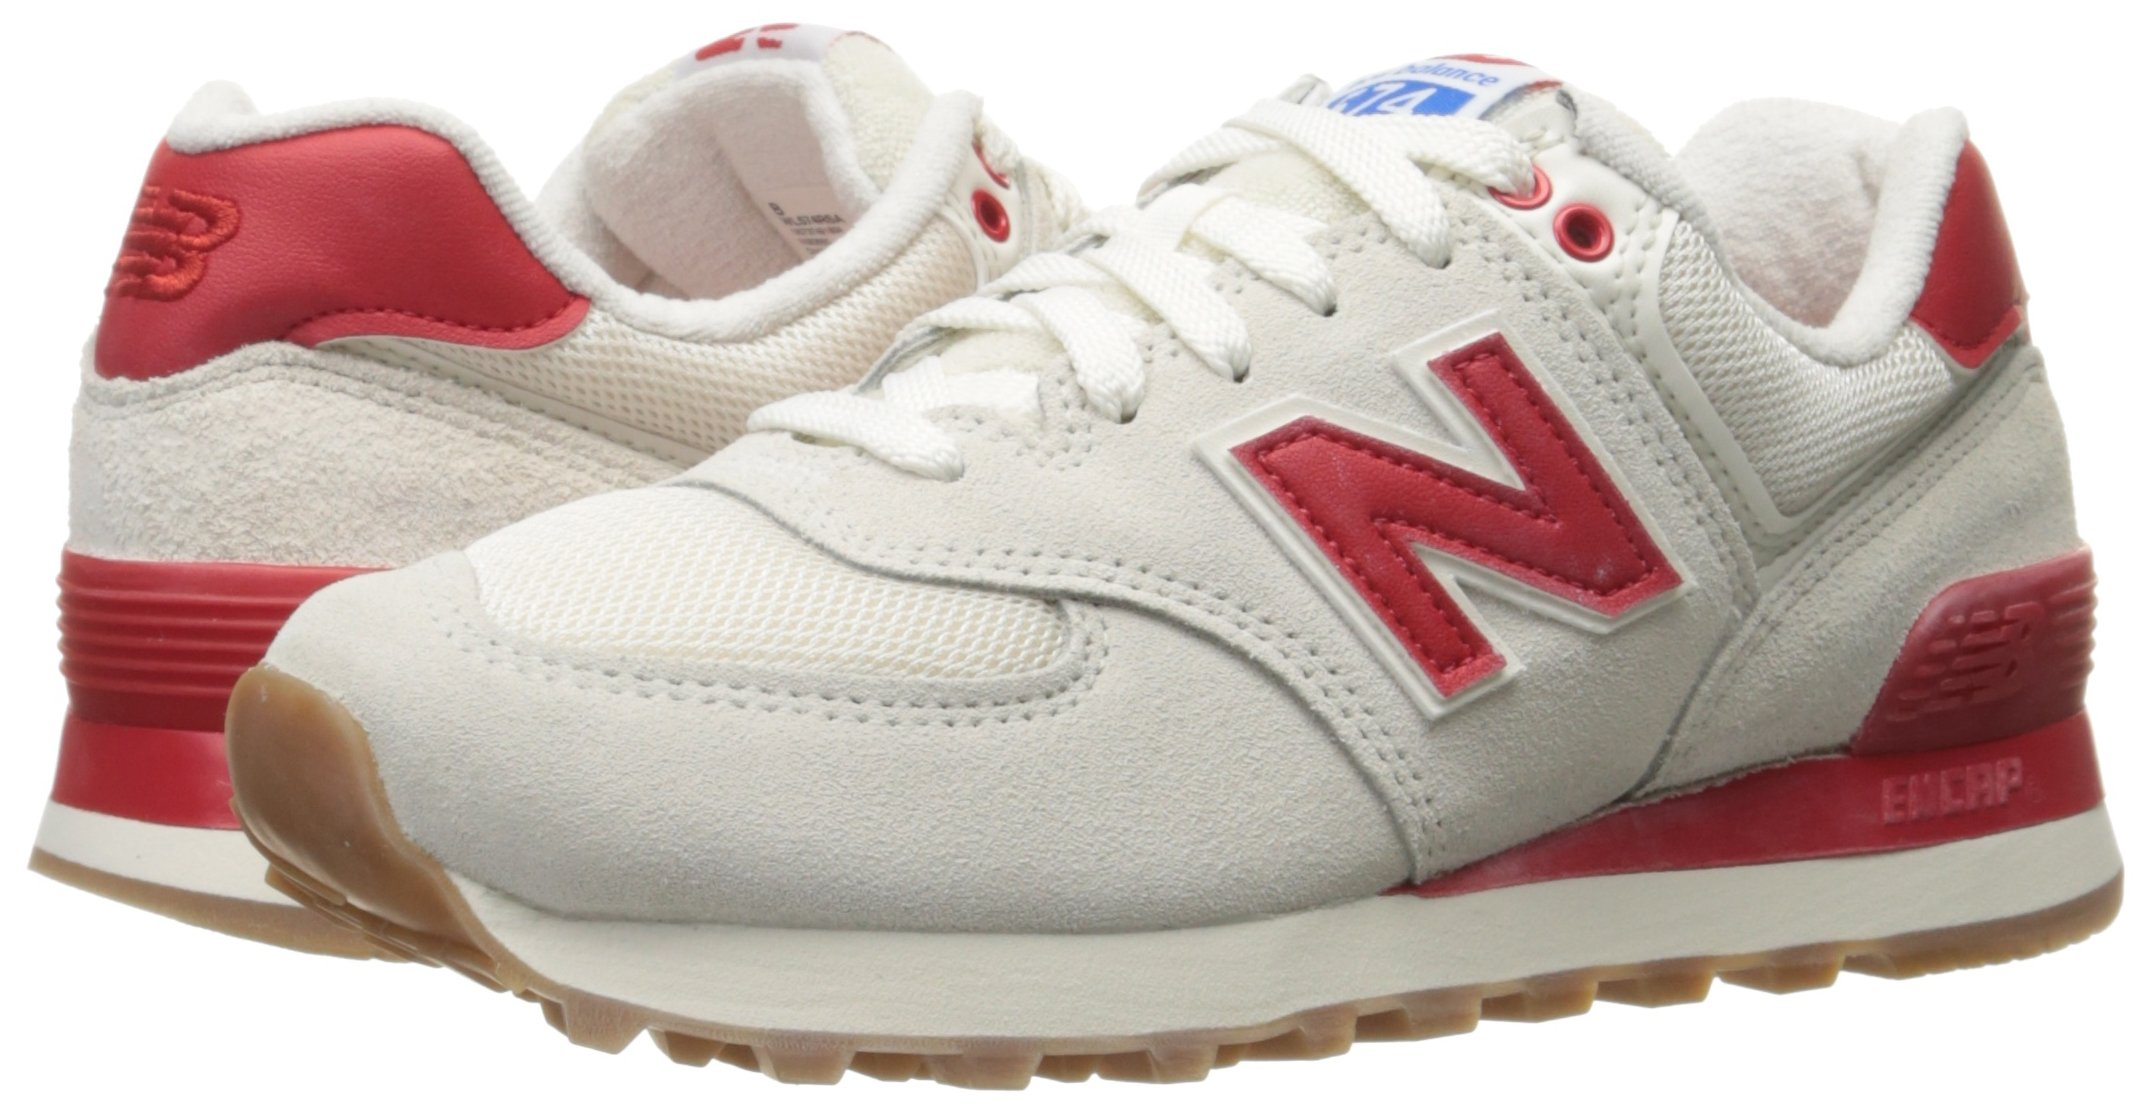 New Balance WL574-RSA-B Sneaker Damen 5.5 US - 36.0 EU